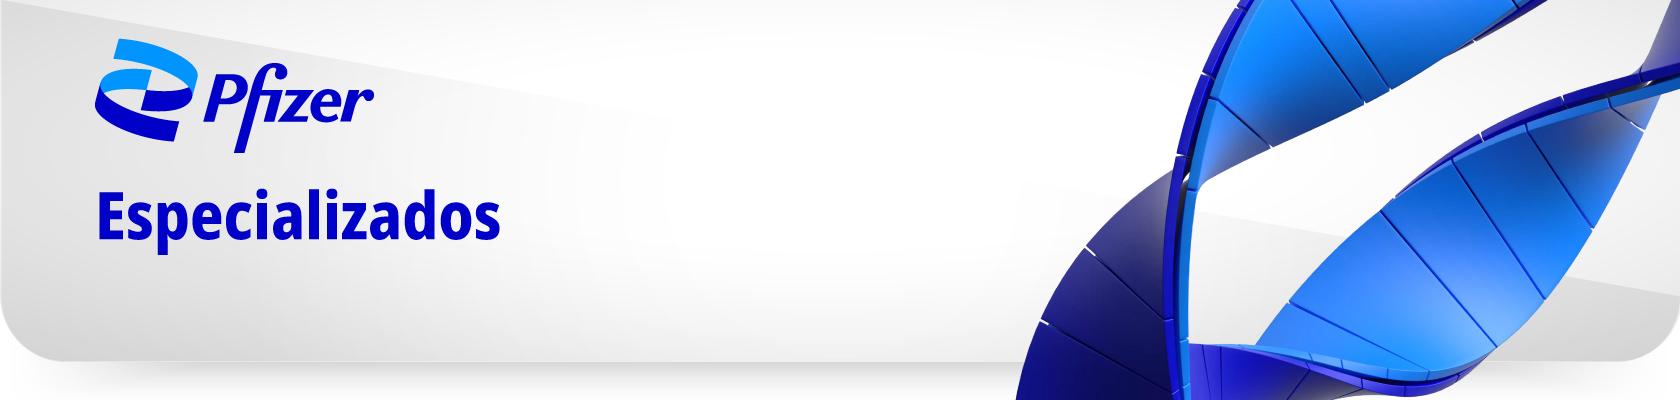 Banner-Especializados-Pfizer_1680X400_01-1-